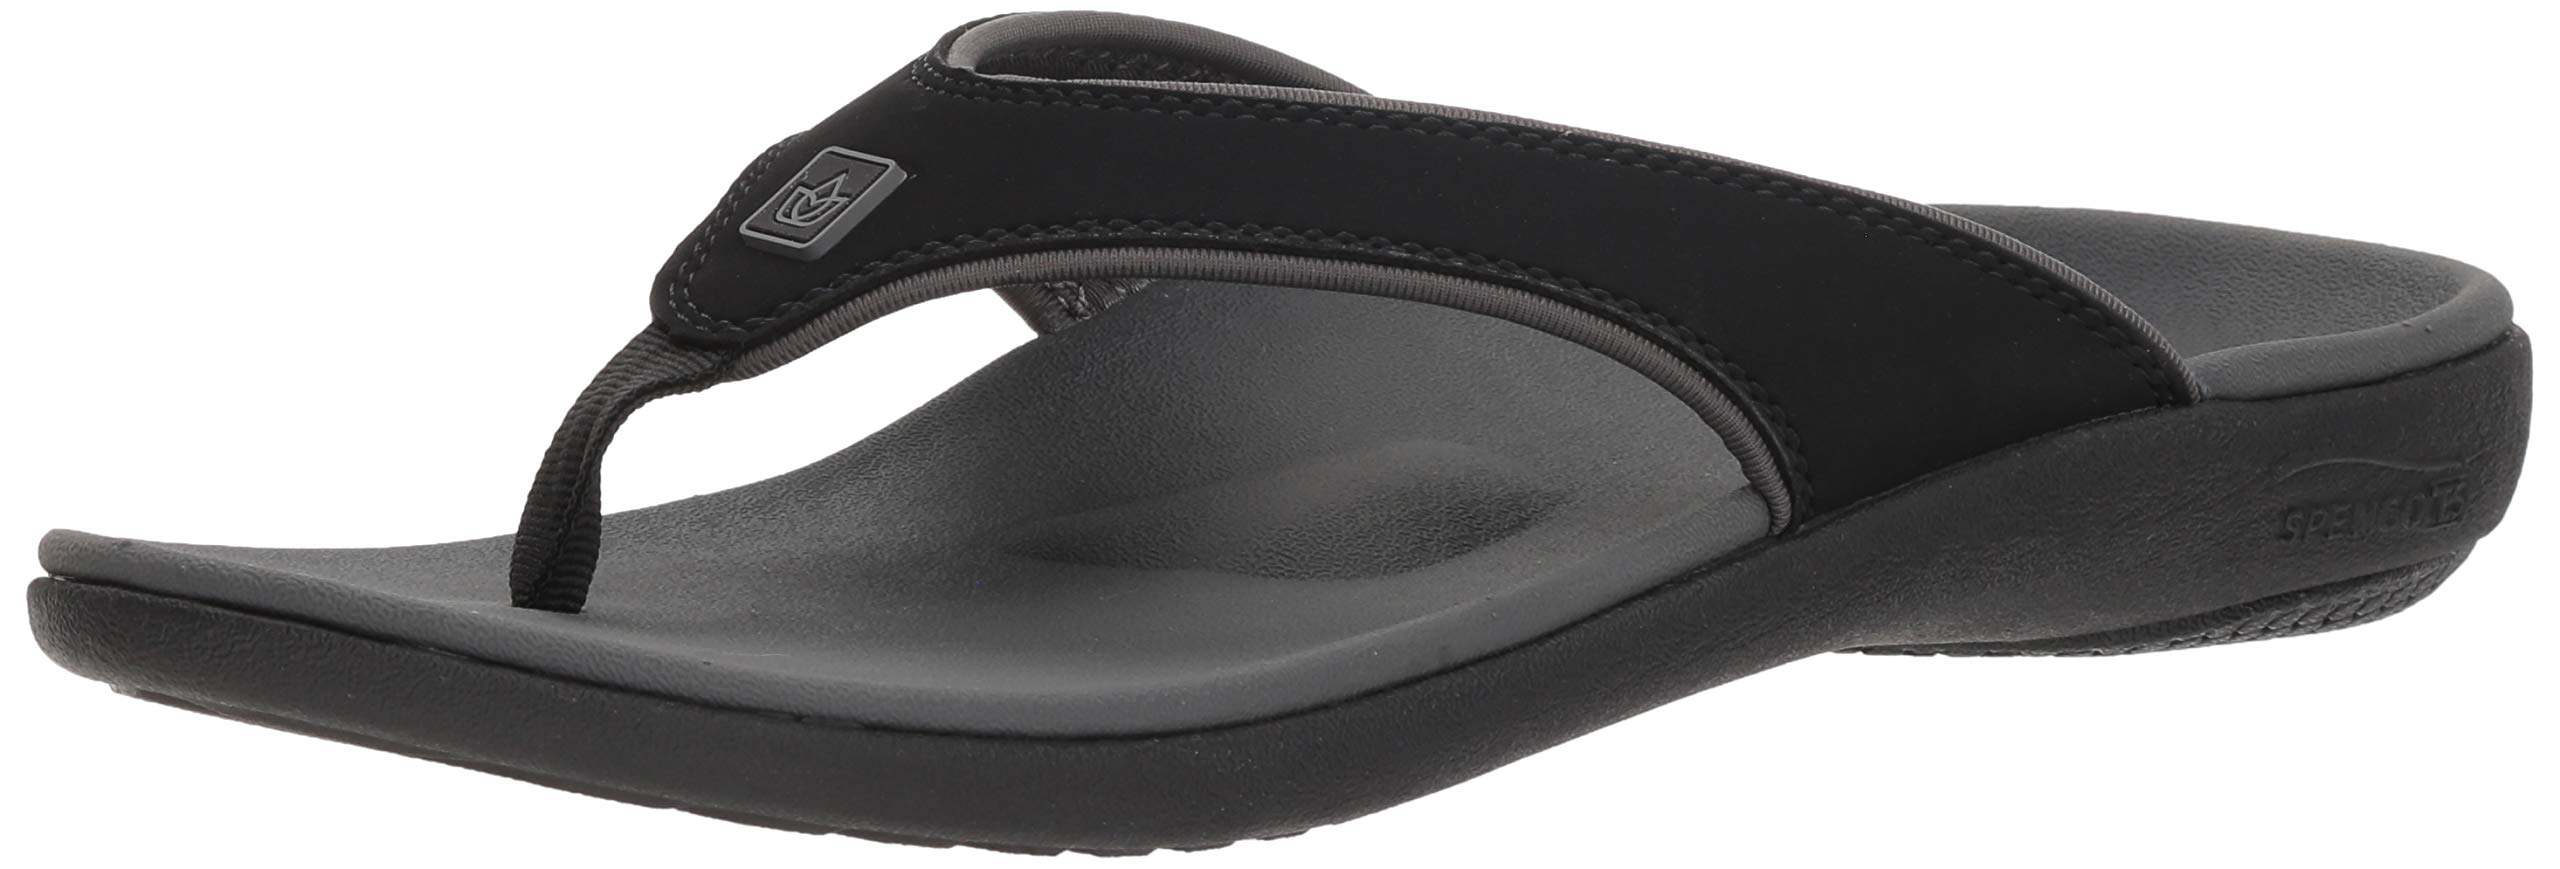 Spenco Men's Yumi Plus Sandal Sandal, Carbon/Pewter, 8 Wide US